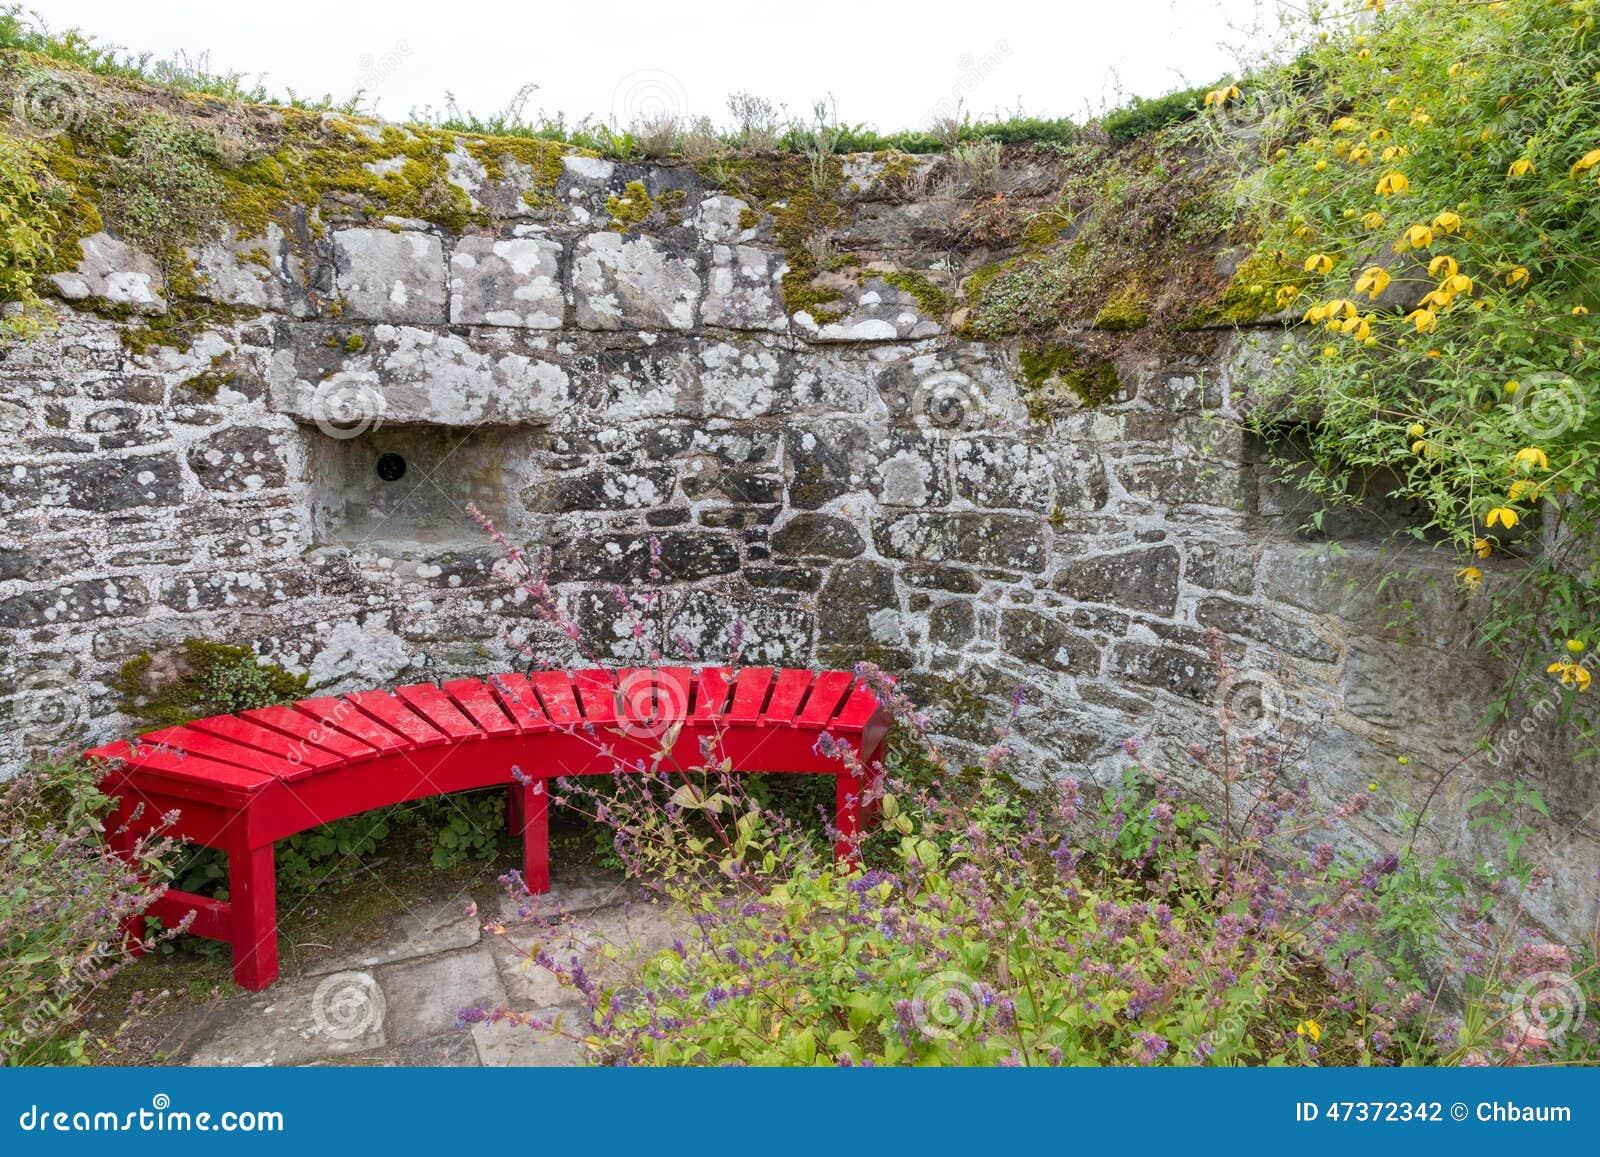 Delightful Red Garden Bench. Comfort, Lawn.